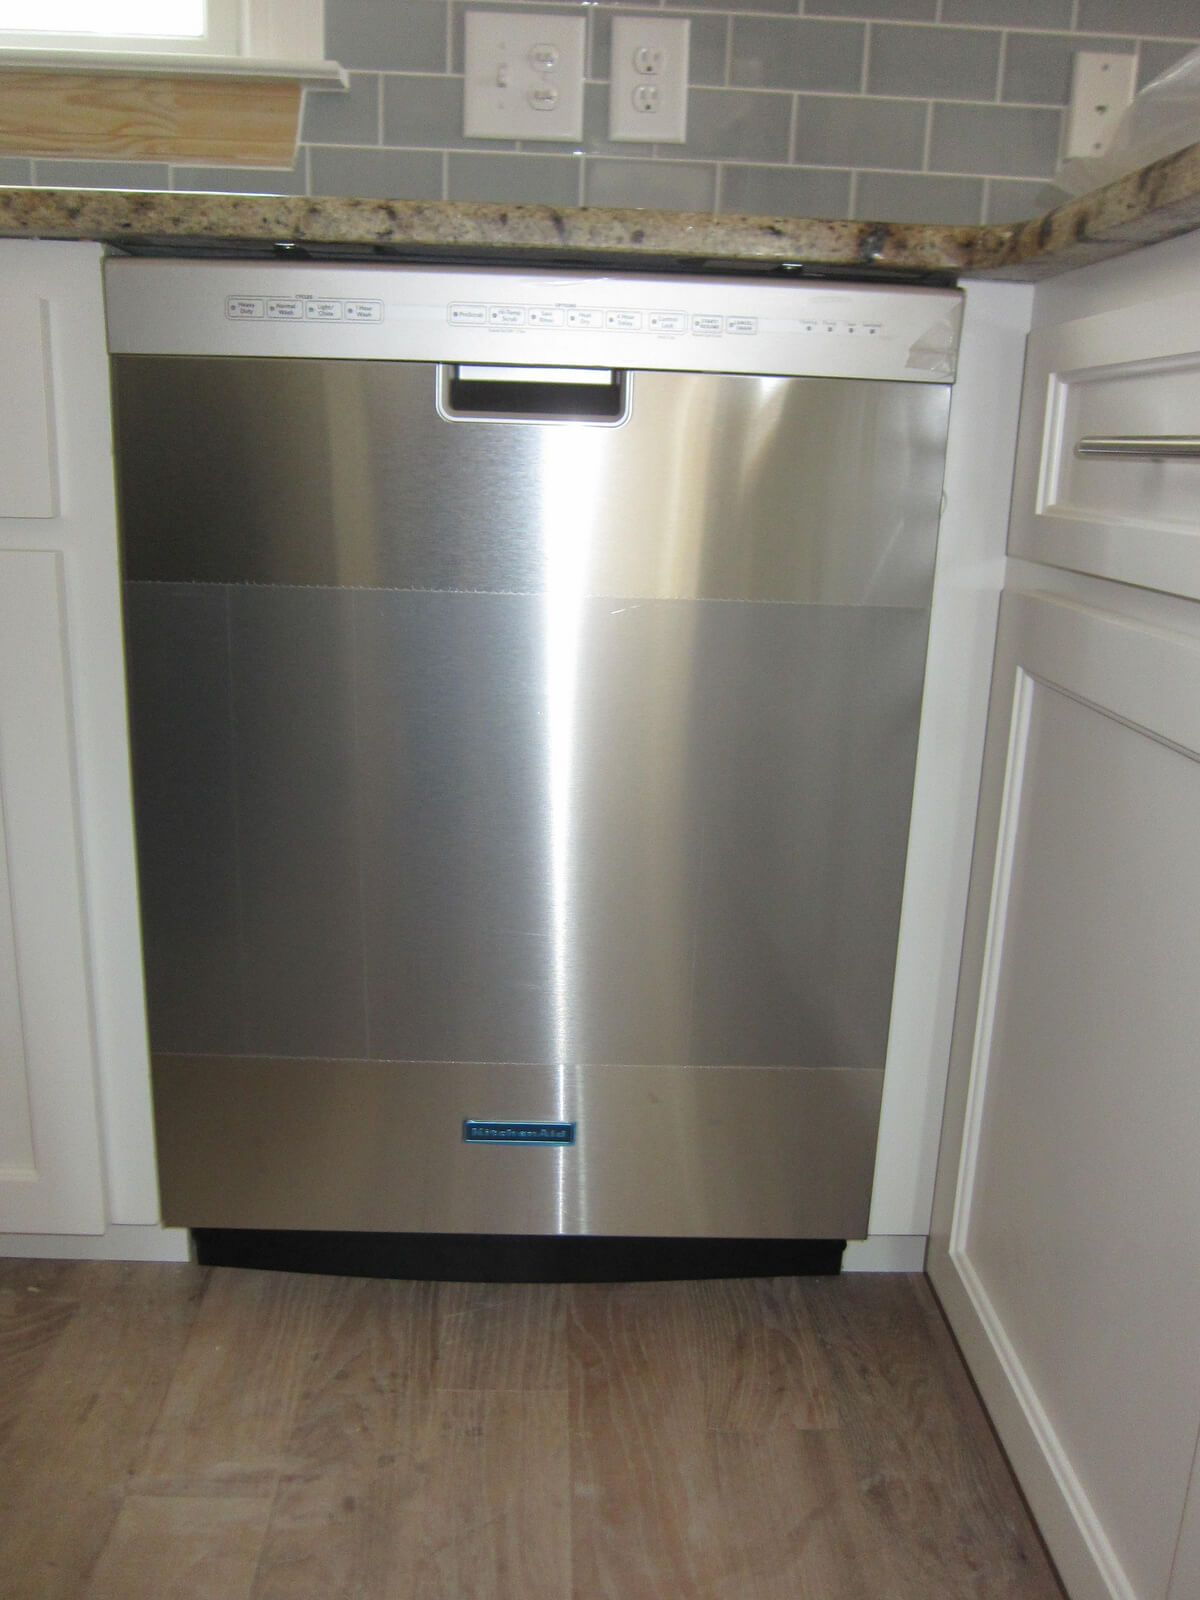 Freezer Repair Service : Home appliance repair service for calgary cochrane autos